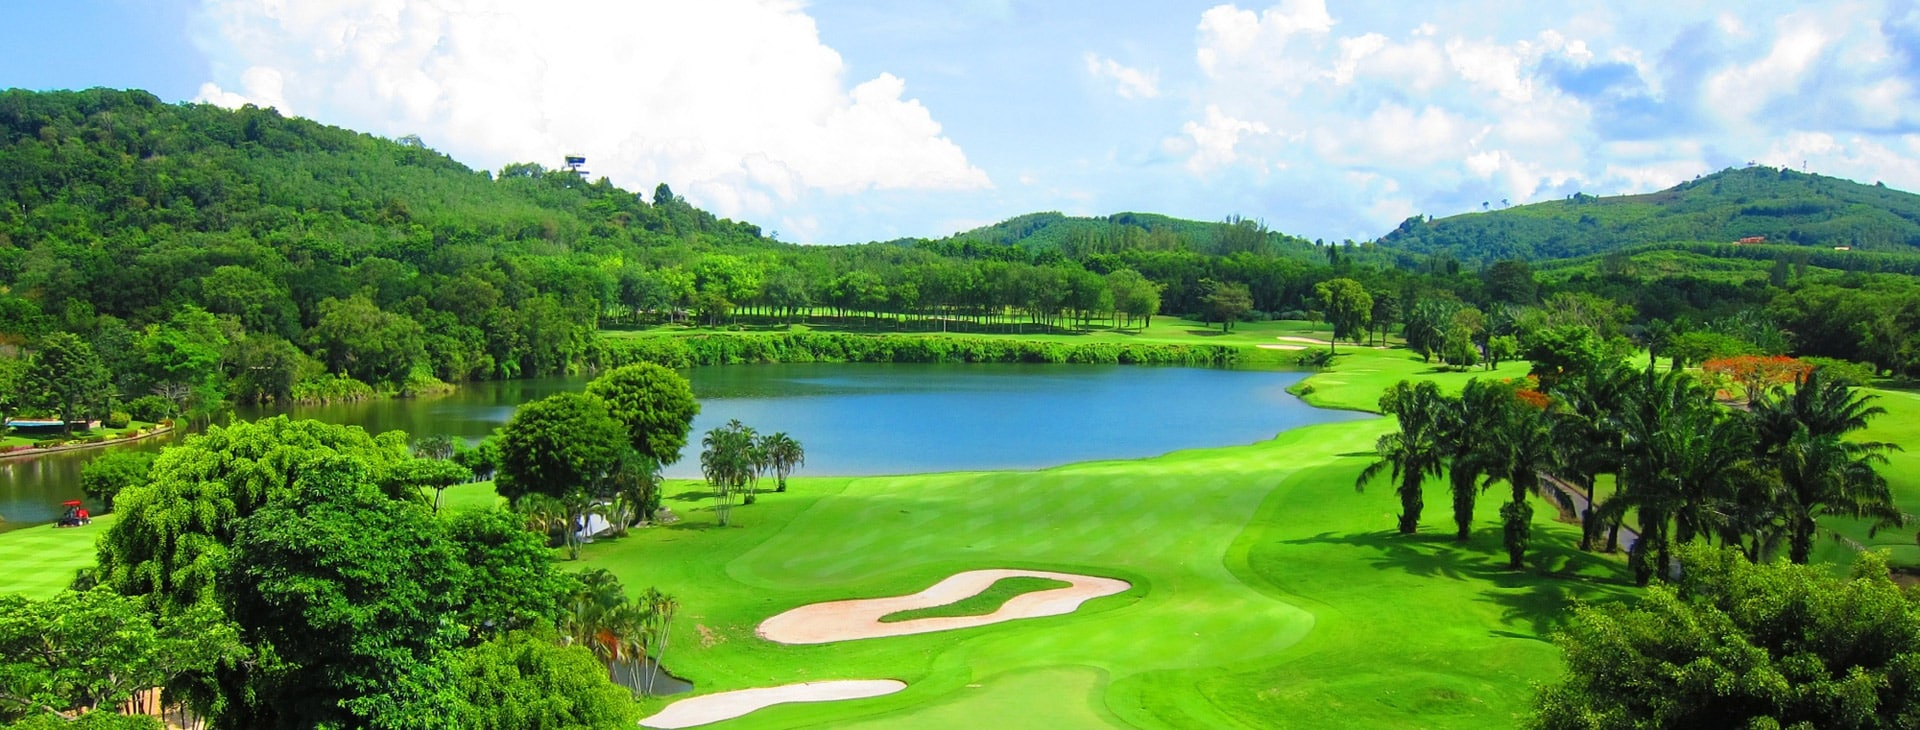 Golf-Thailand_Golf-Courses_Phuket_Blue-Canyon-Golf-Course-Canyon-Course